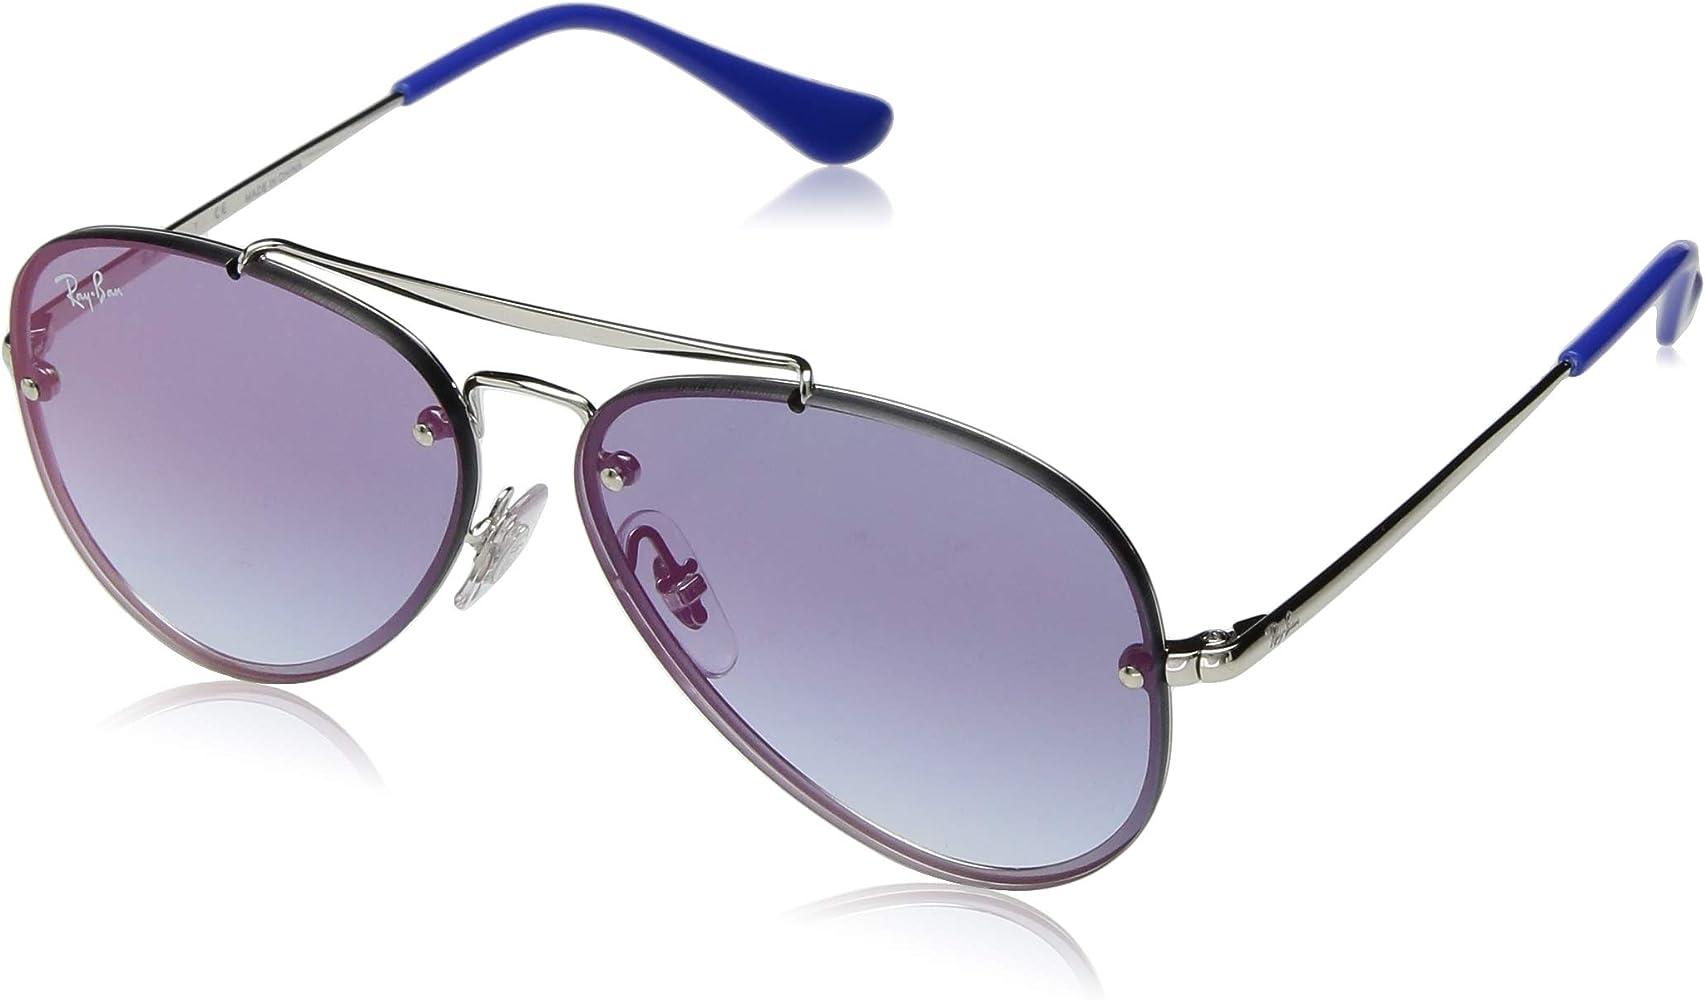 Ray-Ban JUNIOR 0RJ9548SN Gafas de sol, Silver, 54 Unisex ...